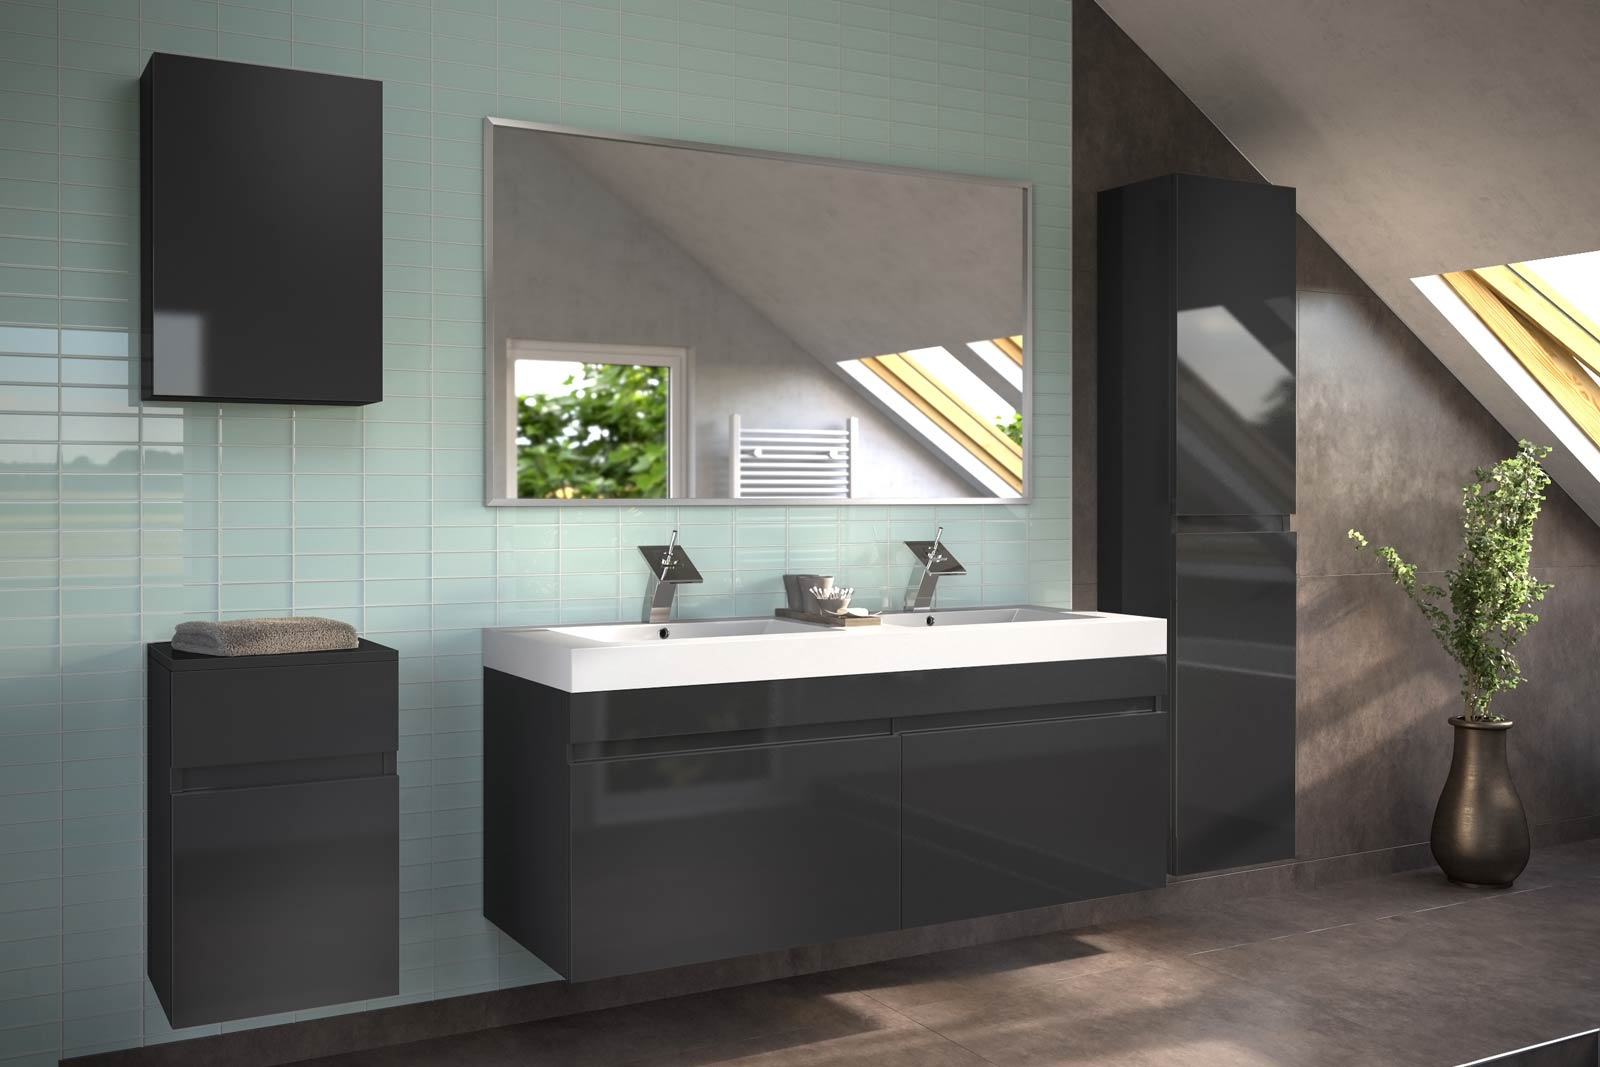 sam badm bel 5tlg set softclose hochglanz schwarz parma. Black Bedroom Furniture Sets. Home Design Ideas